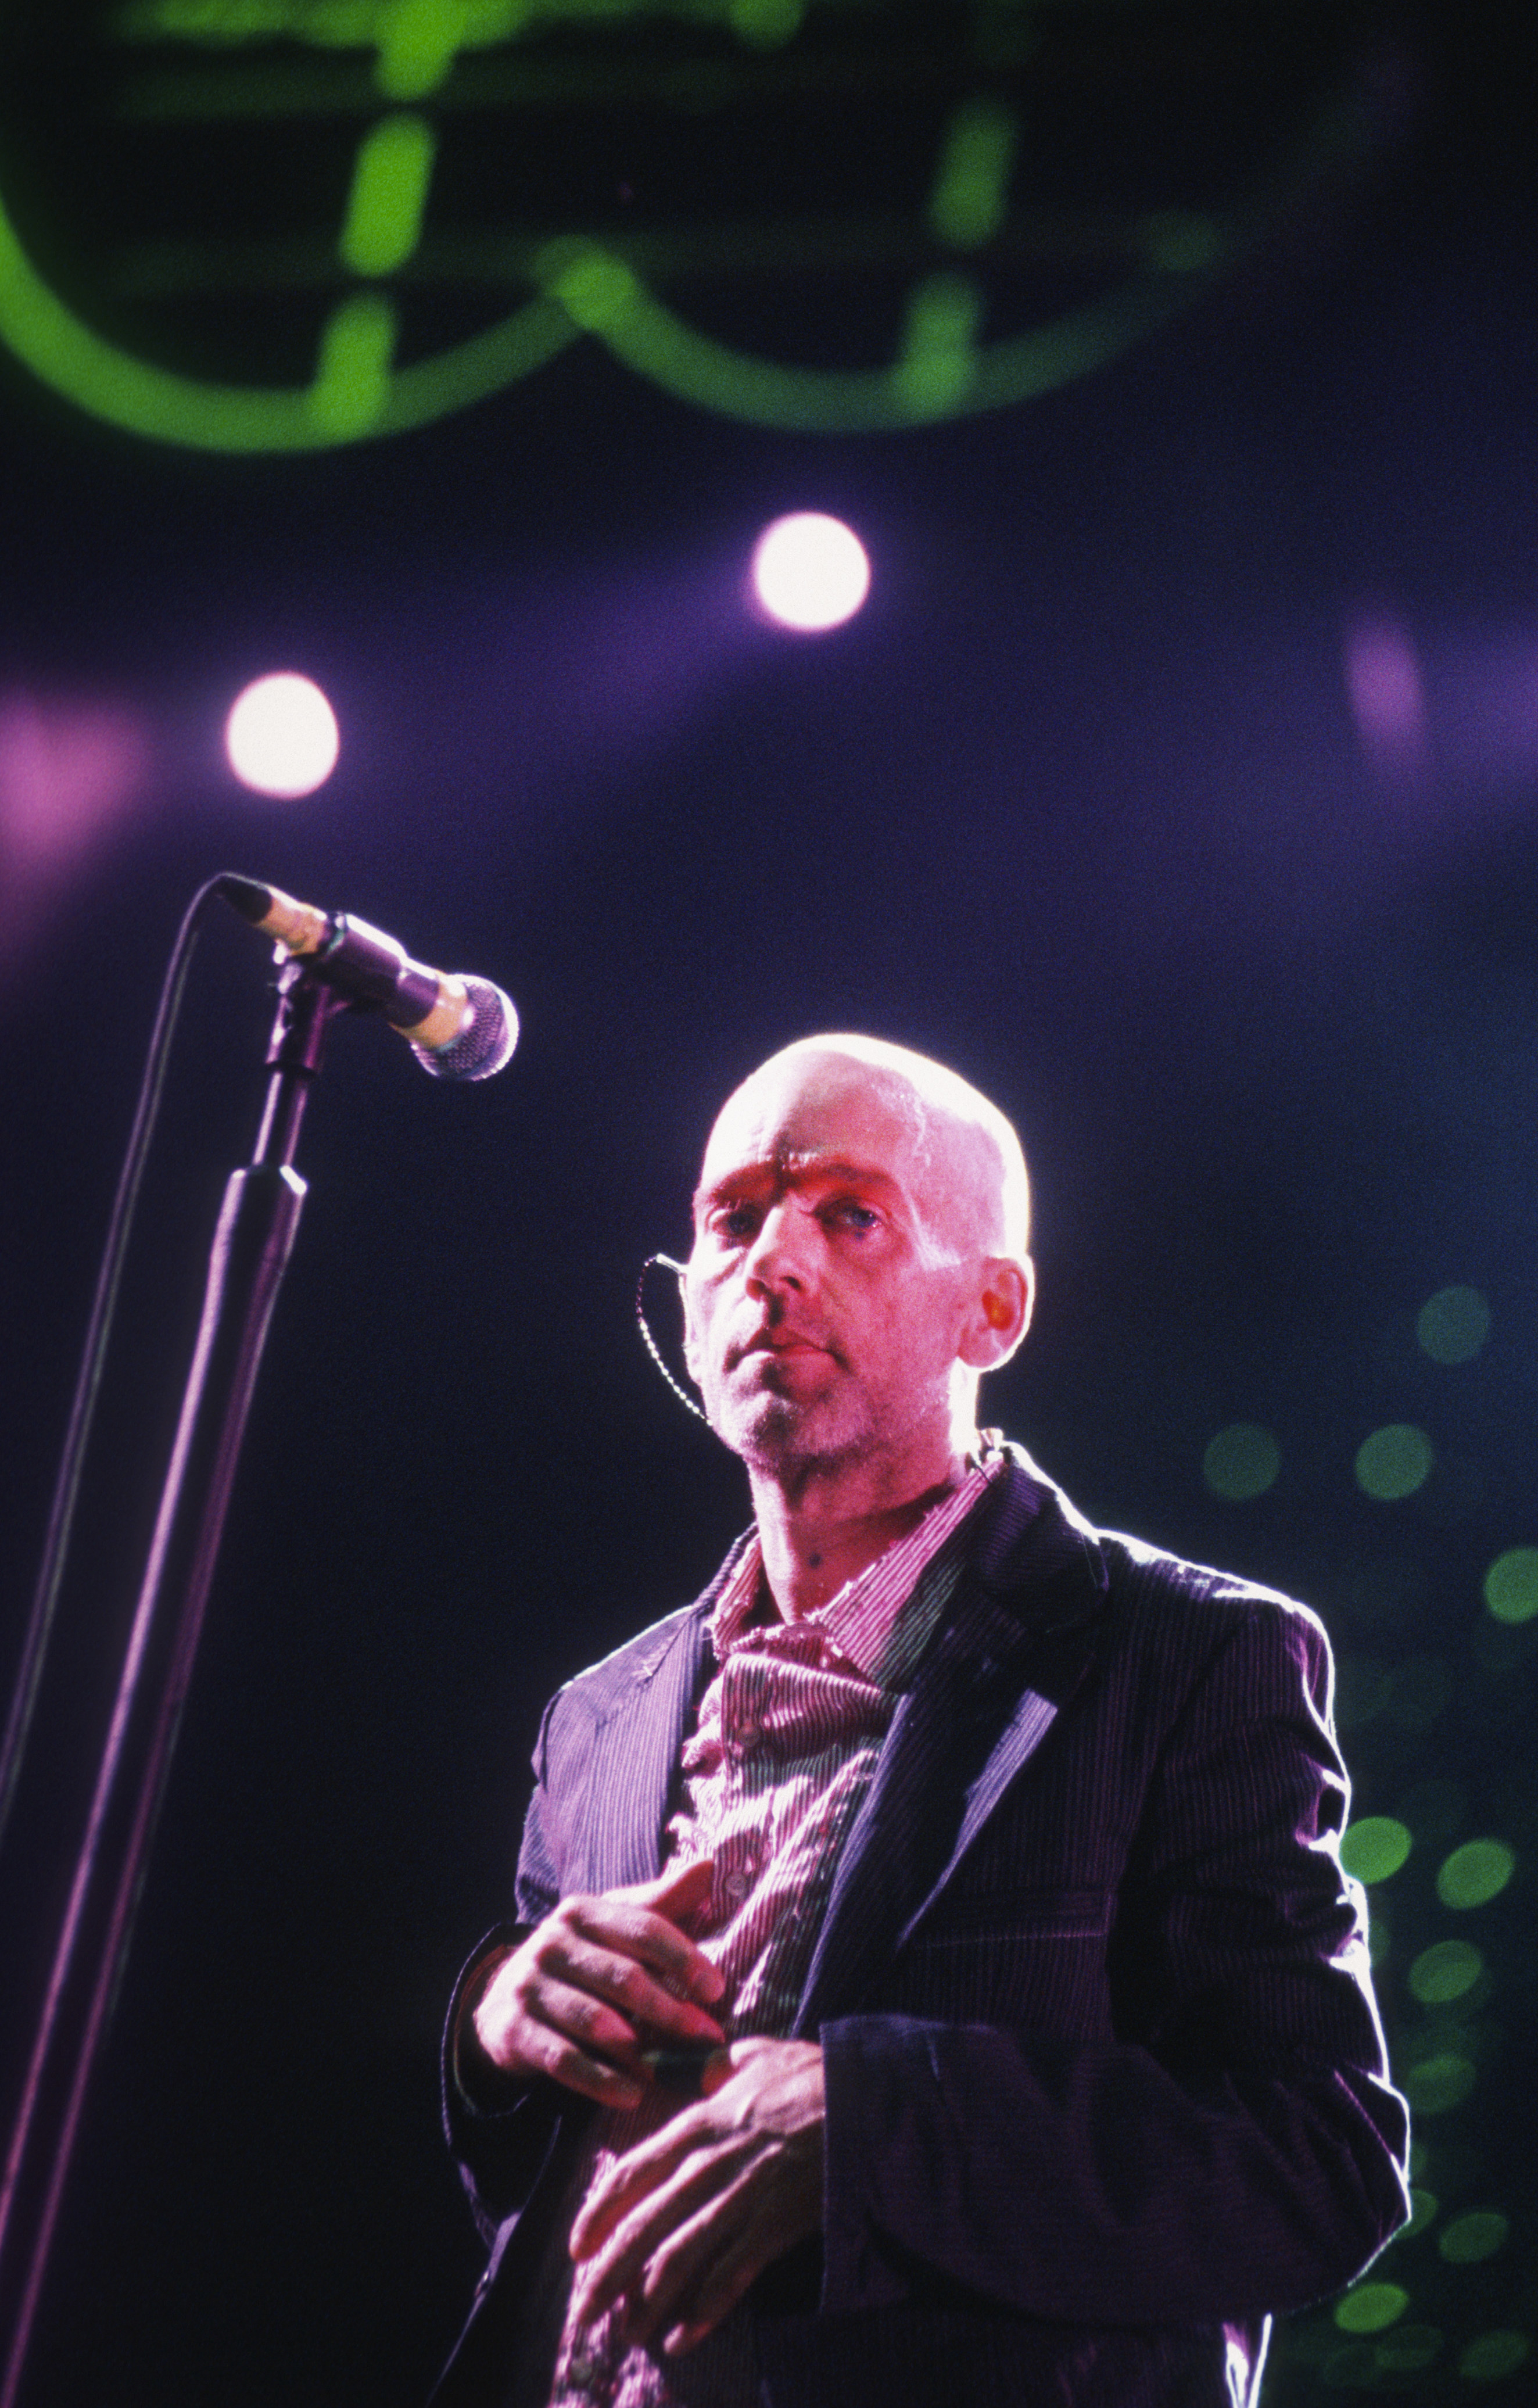 michael stipe in concert